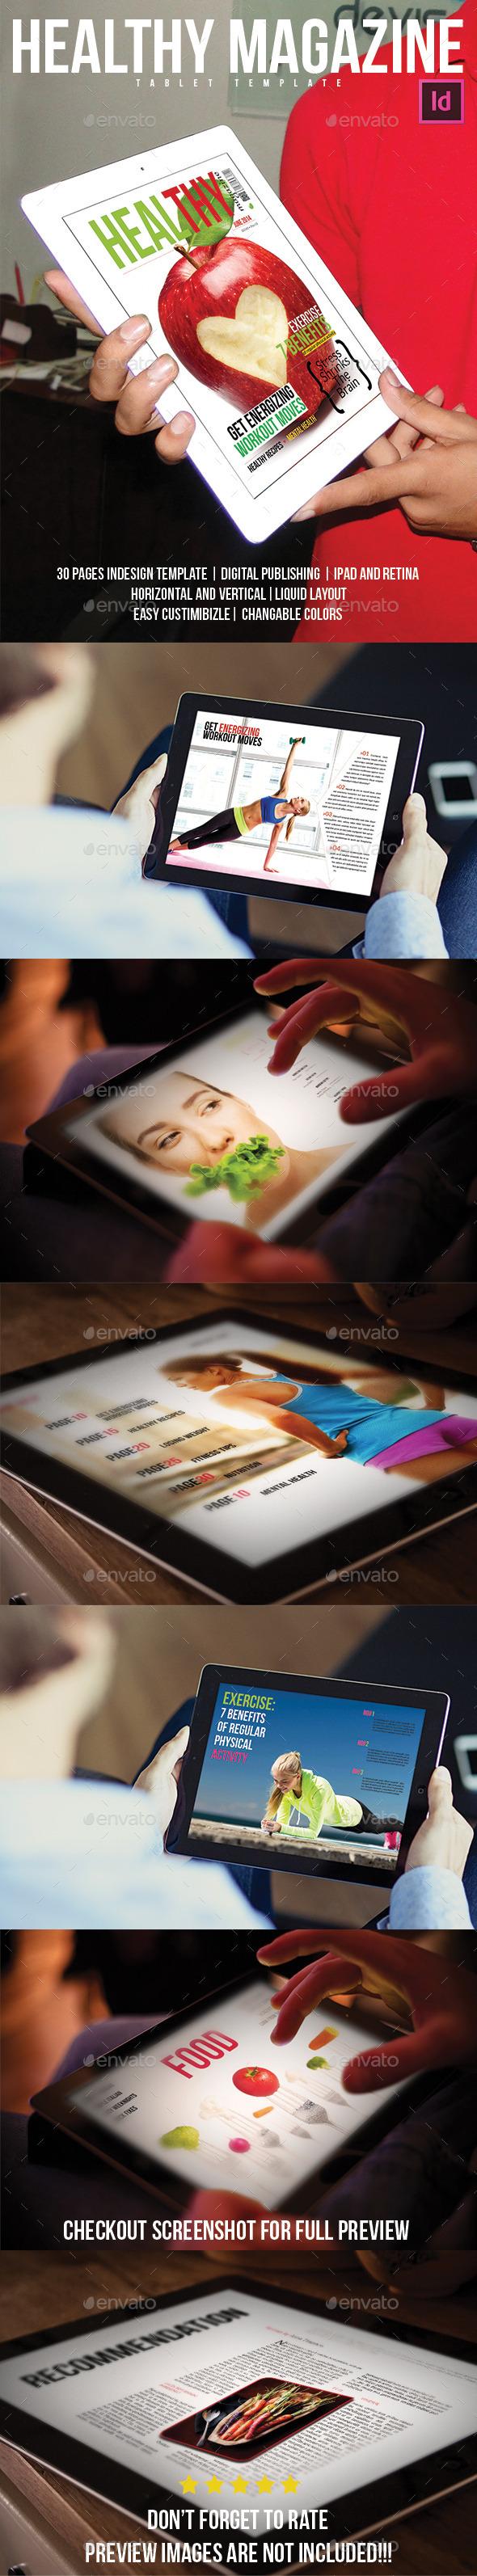 Healthy Magazine Tablet Template - Digital Magazines ePublishing